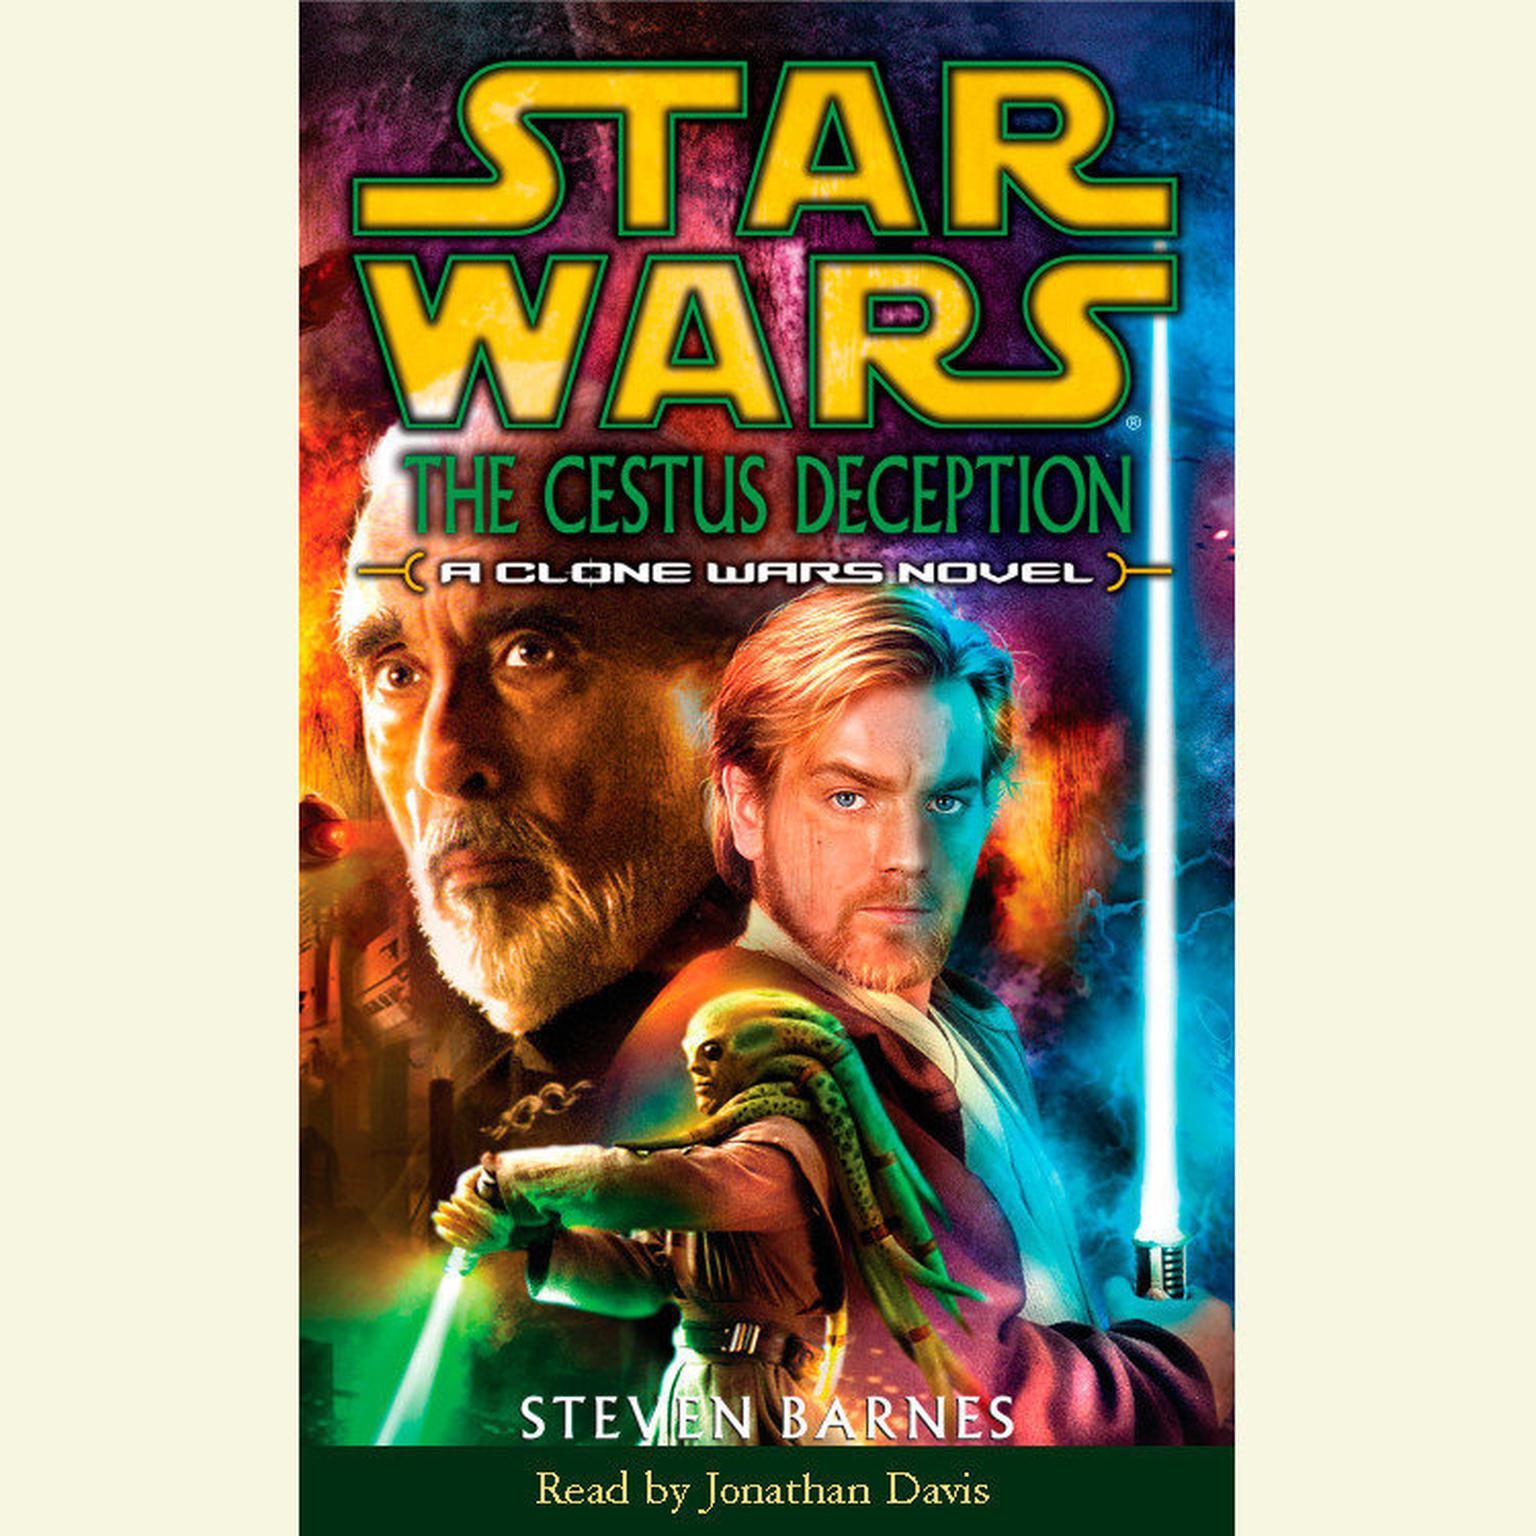 Star Wars: Clone Wars: The Cestus Deception (Abridged): A Clone Wars Novel Audiobook, by Steven Barnes